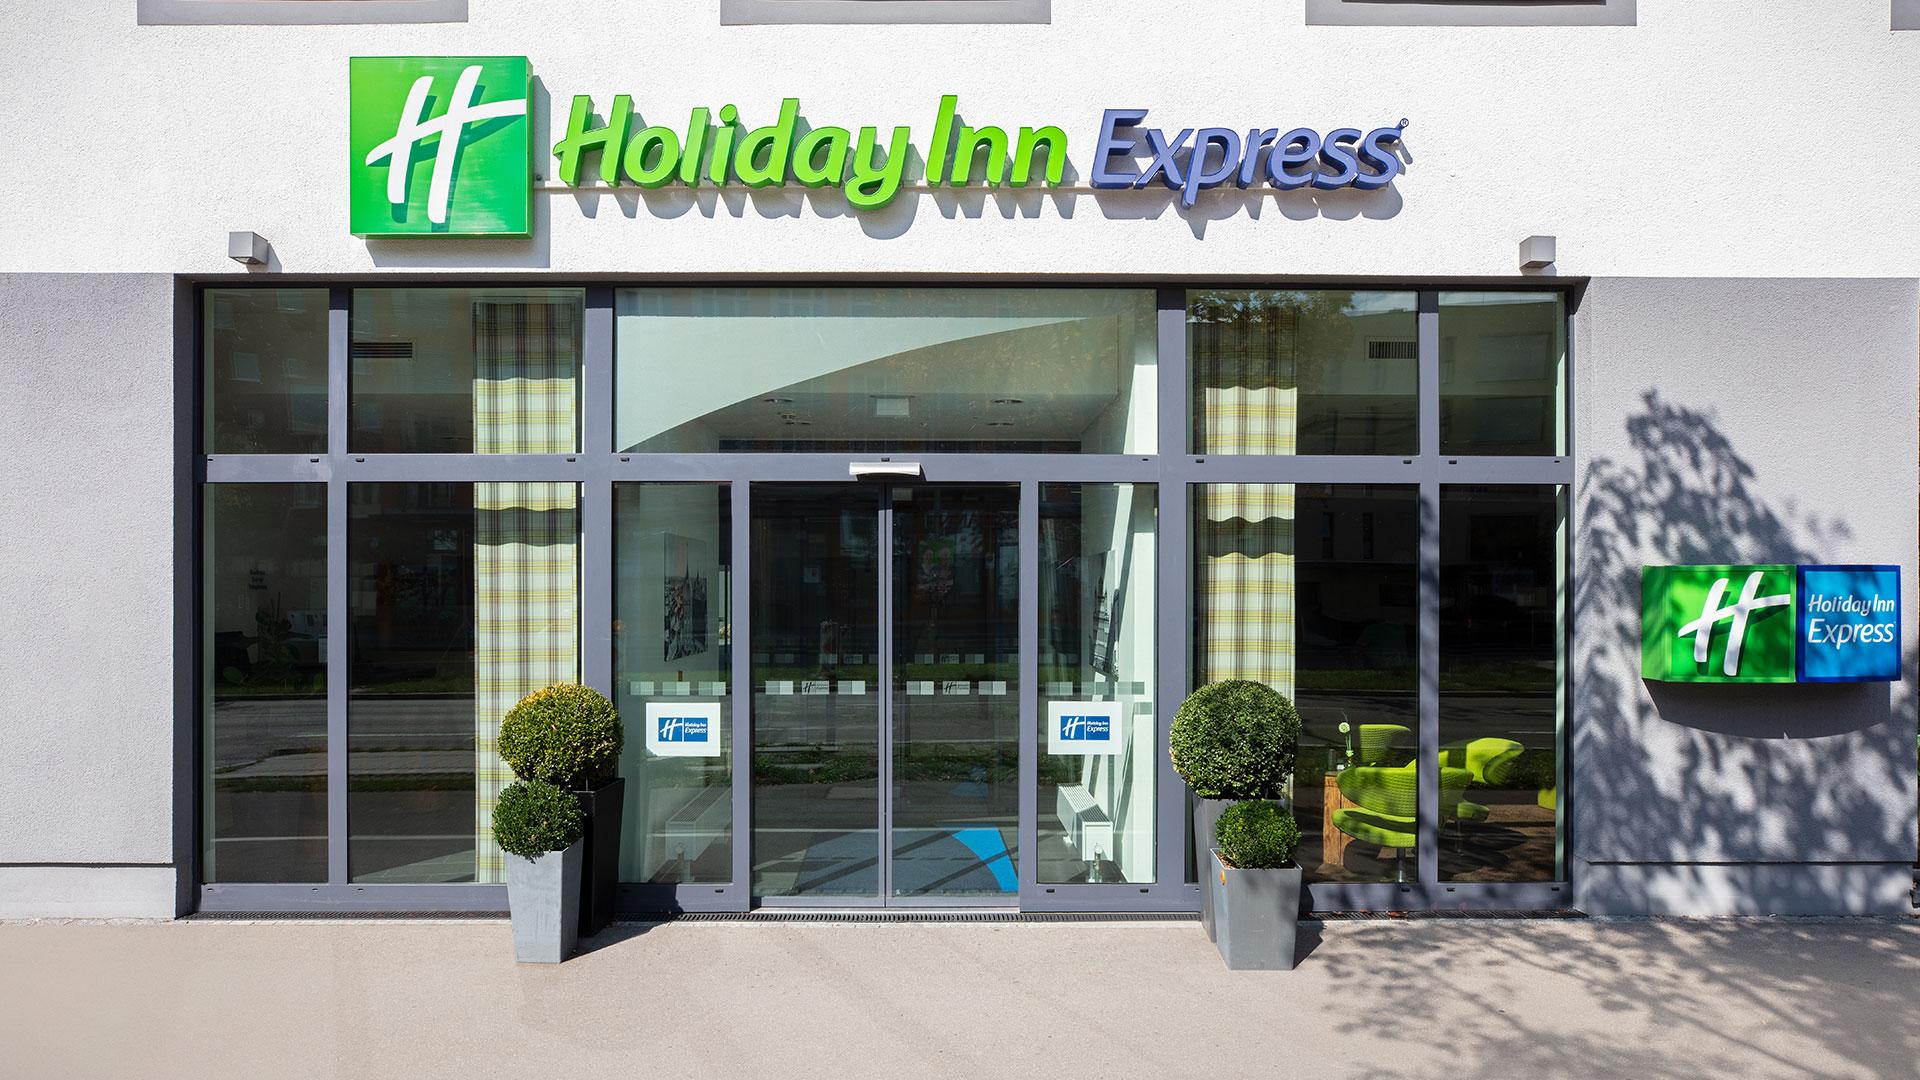 Exterior photo - 04 - Holiday Inn Express Augsburg